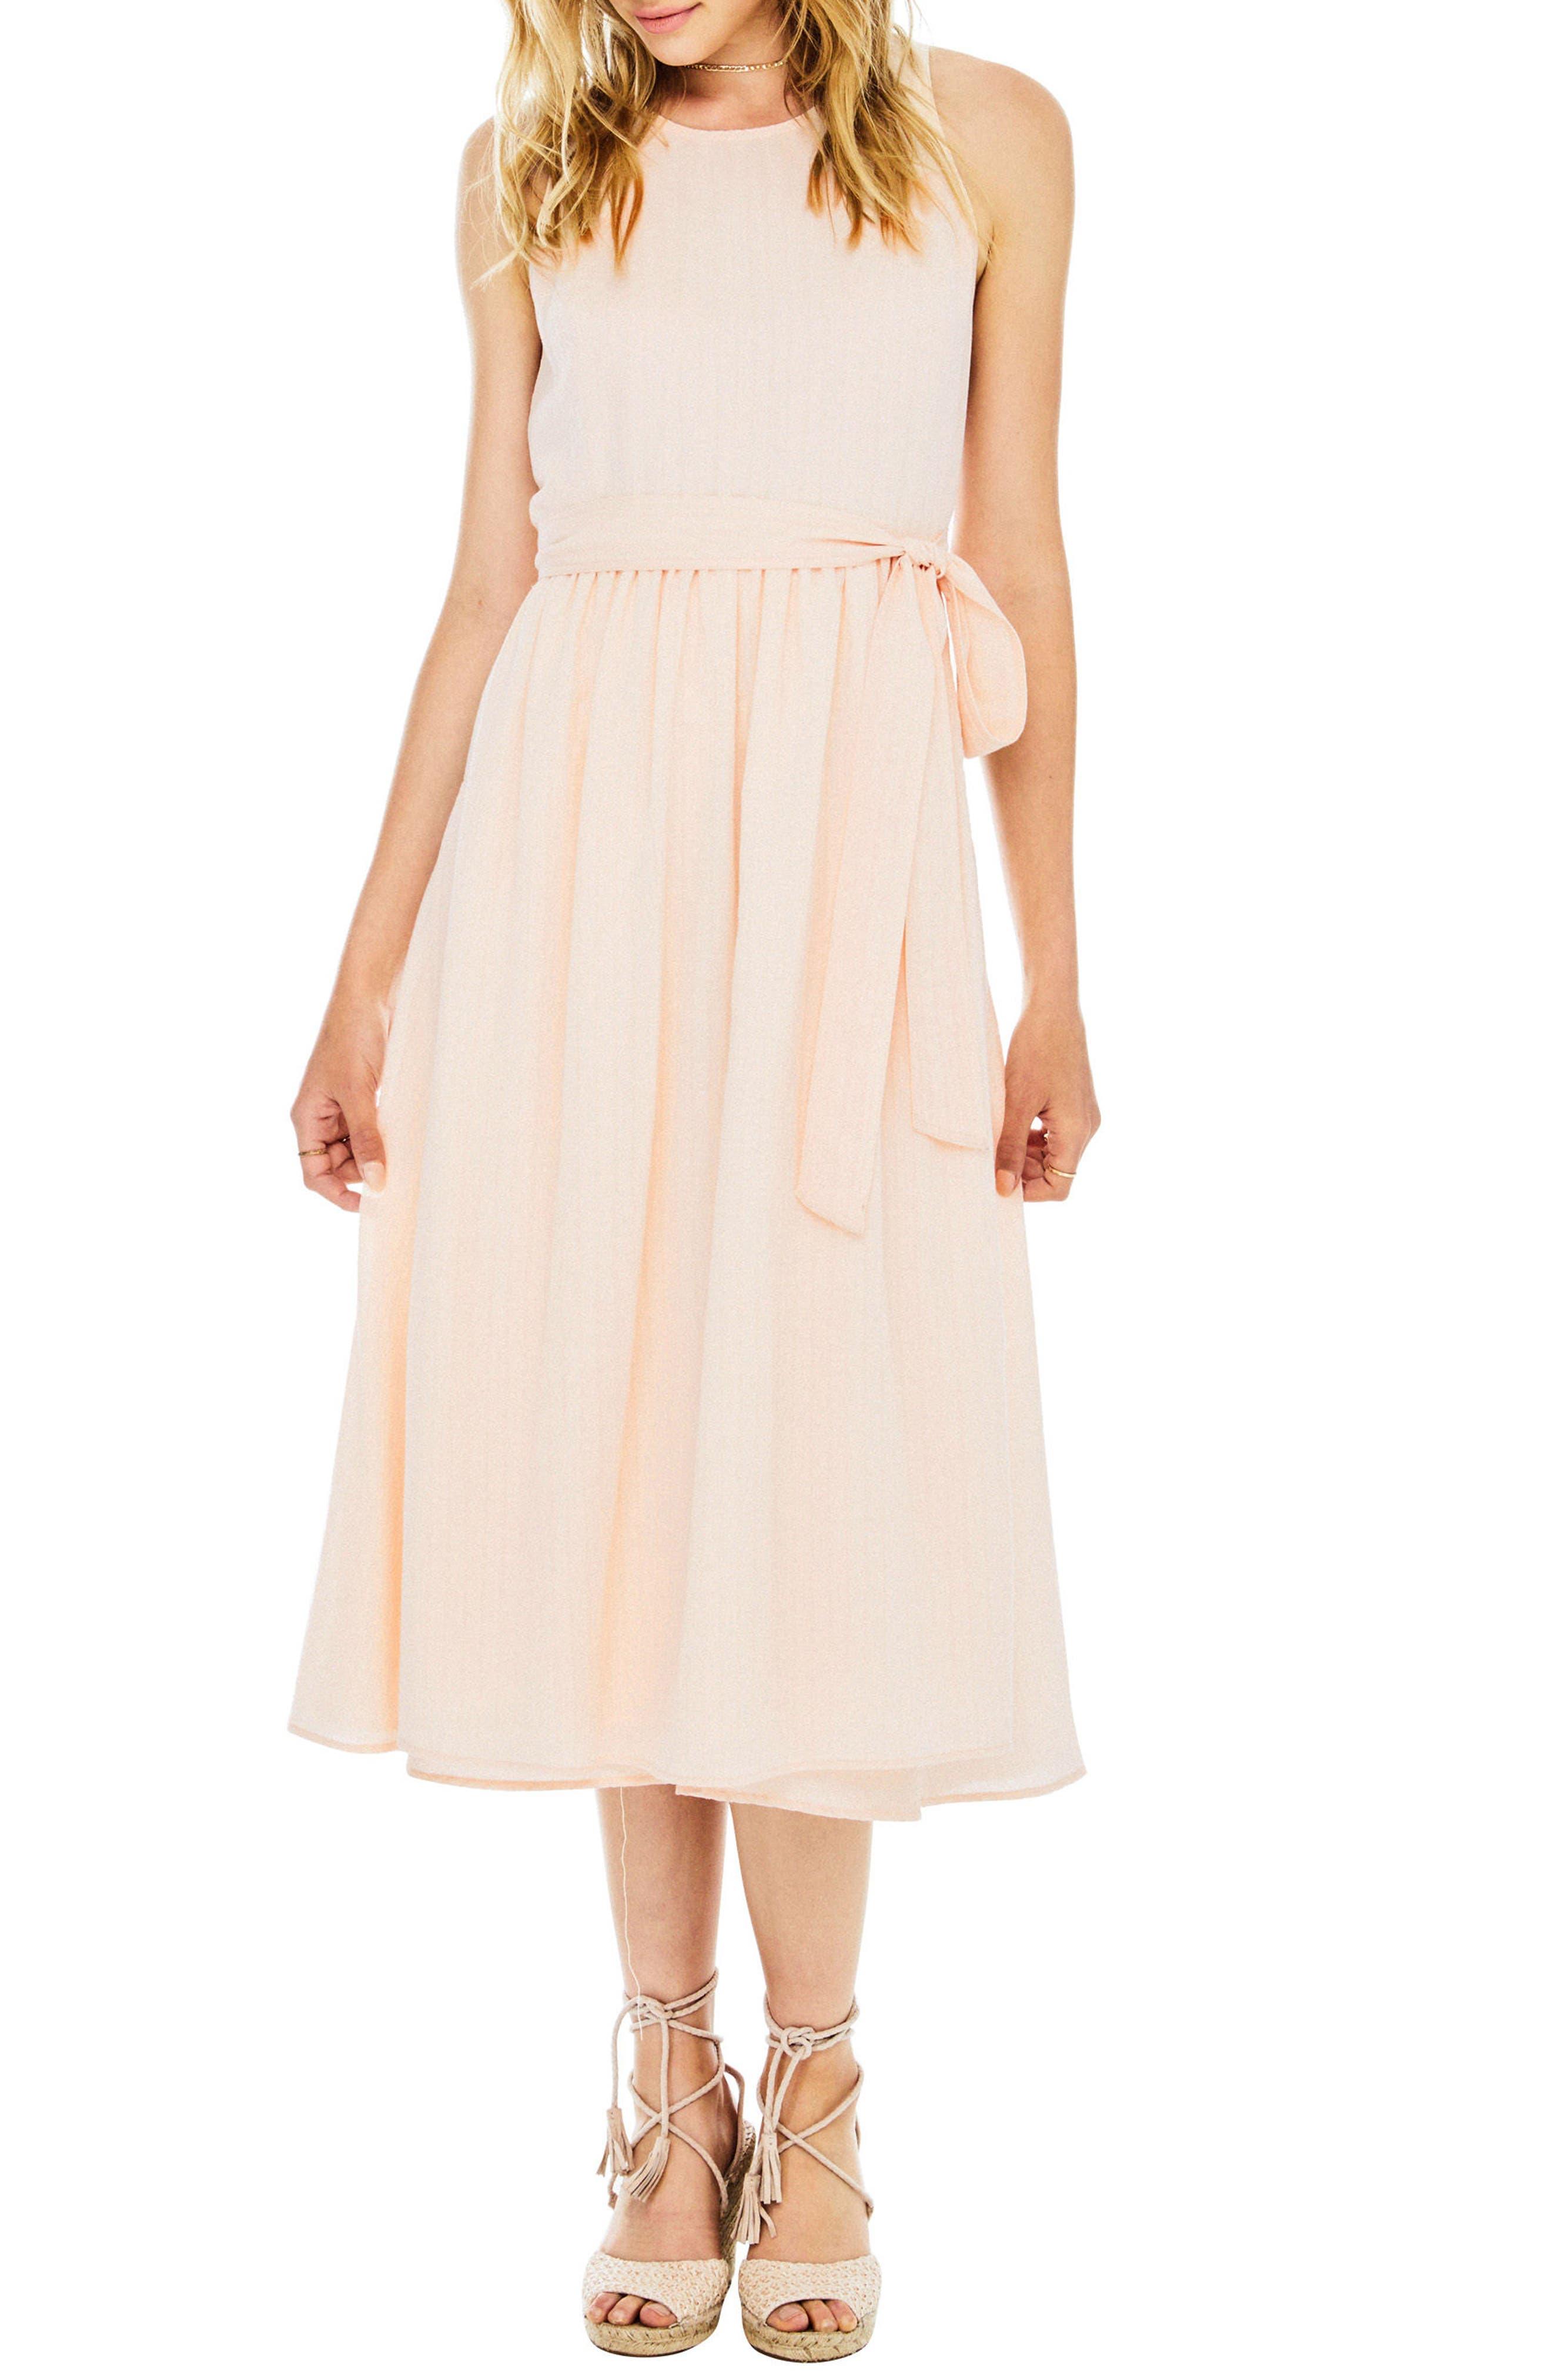 Brady Dress,                             Main thumbnail 1, color,                             668